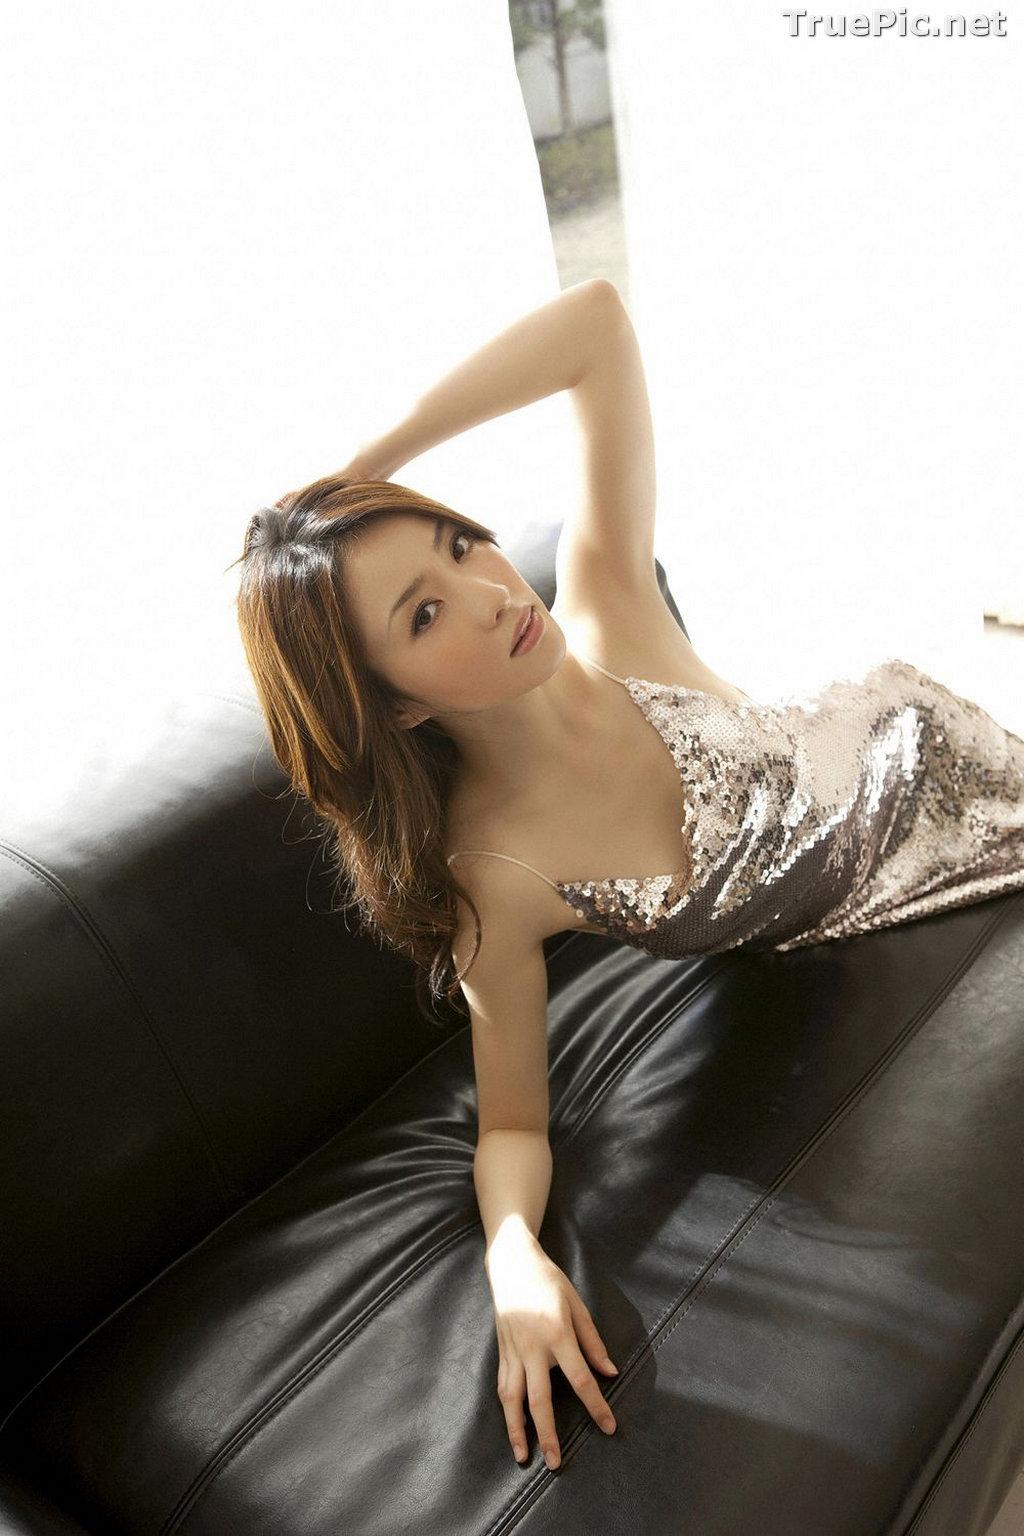 Image [YS Web] Vol.340 - Japanese Model and Actress - Saki Seto - TruePic.net - Picture-8